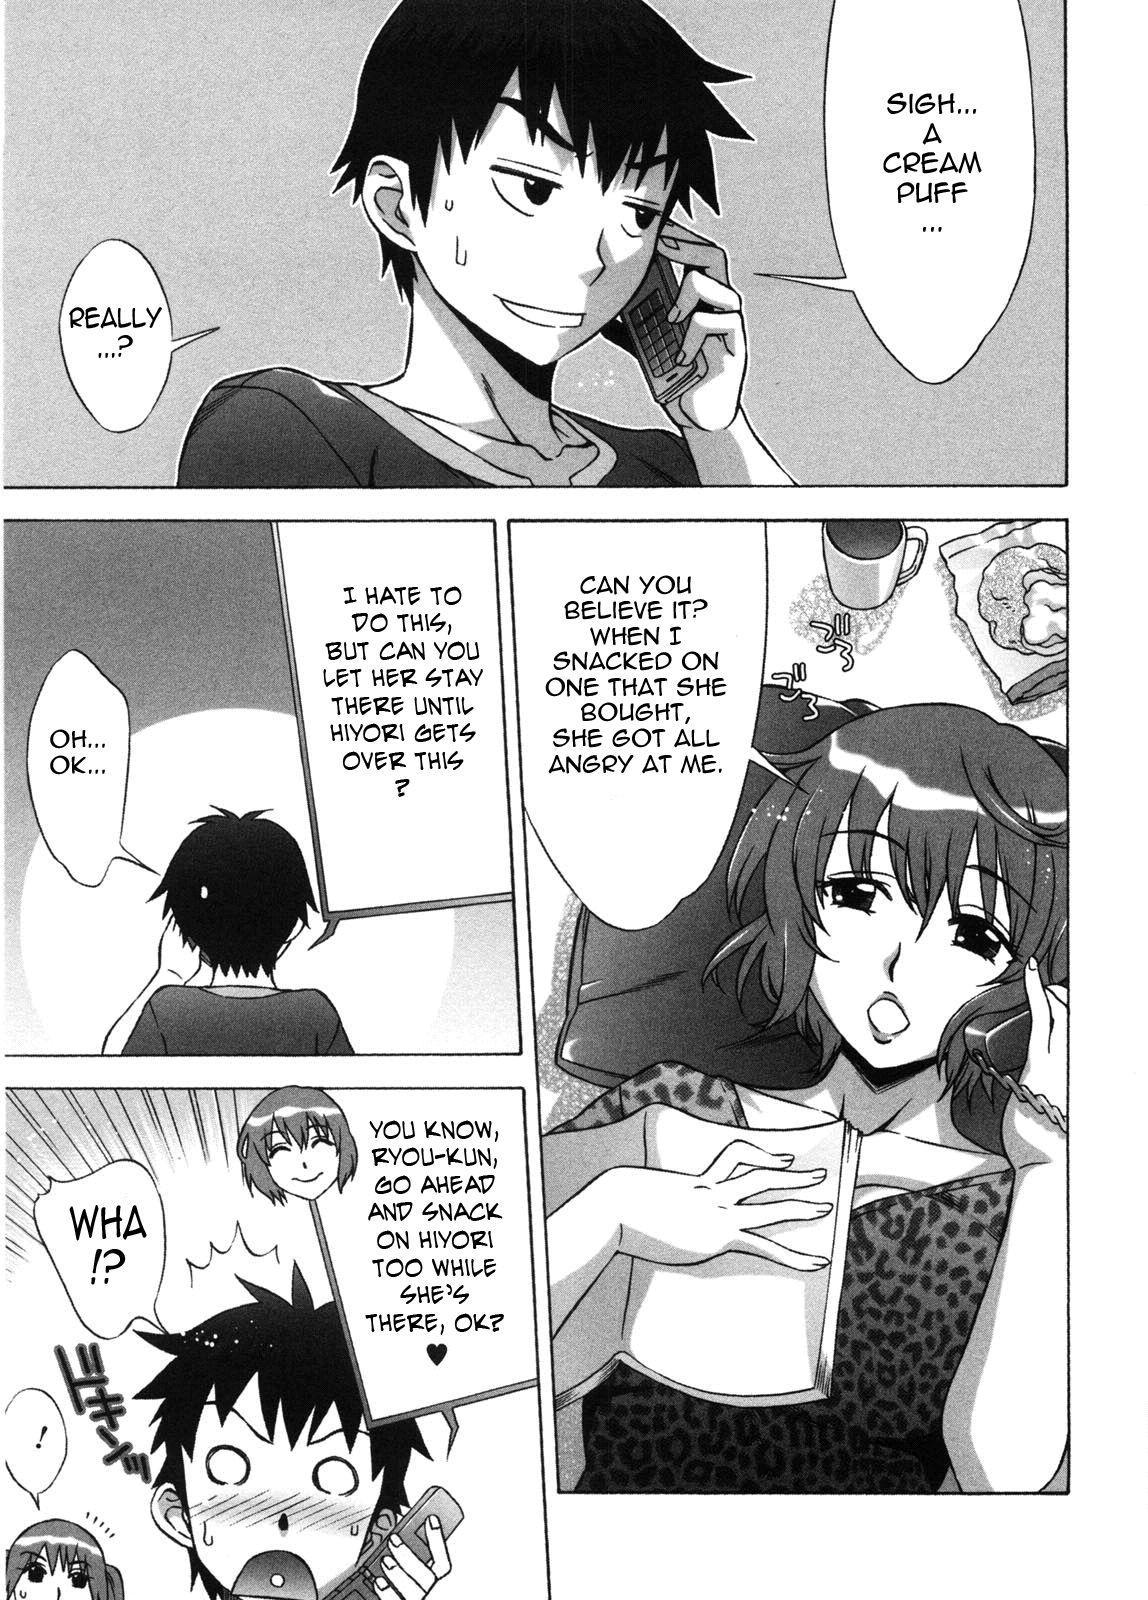 [Hanzaki Jirou] Ama Ero - Sweet Sugar Baby Ch. 1-7 [English] [Tadanohito] [Decensored] 89